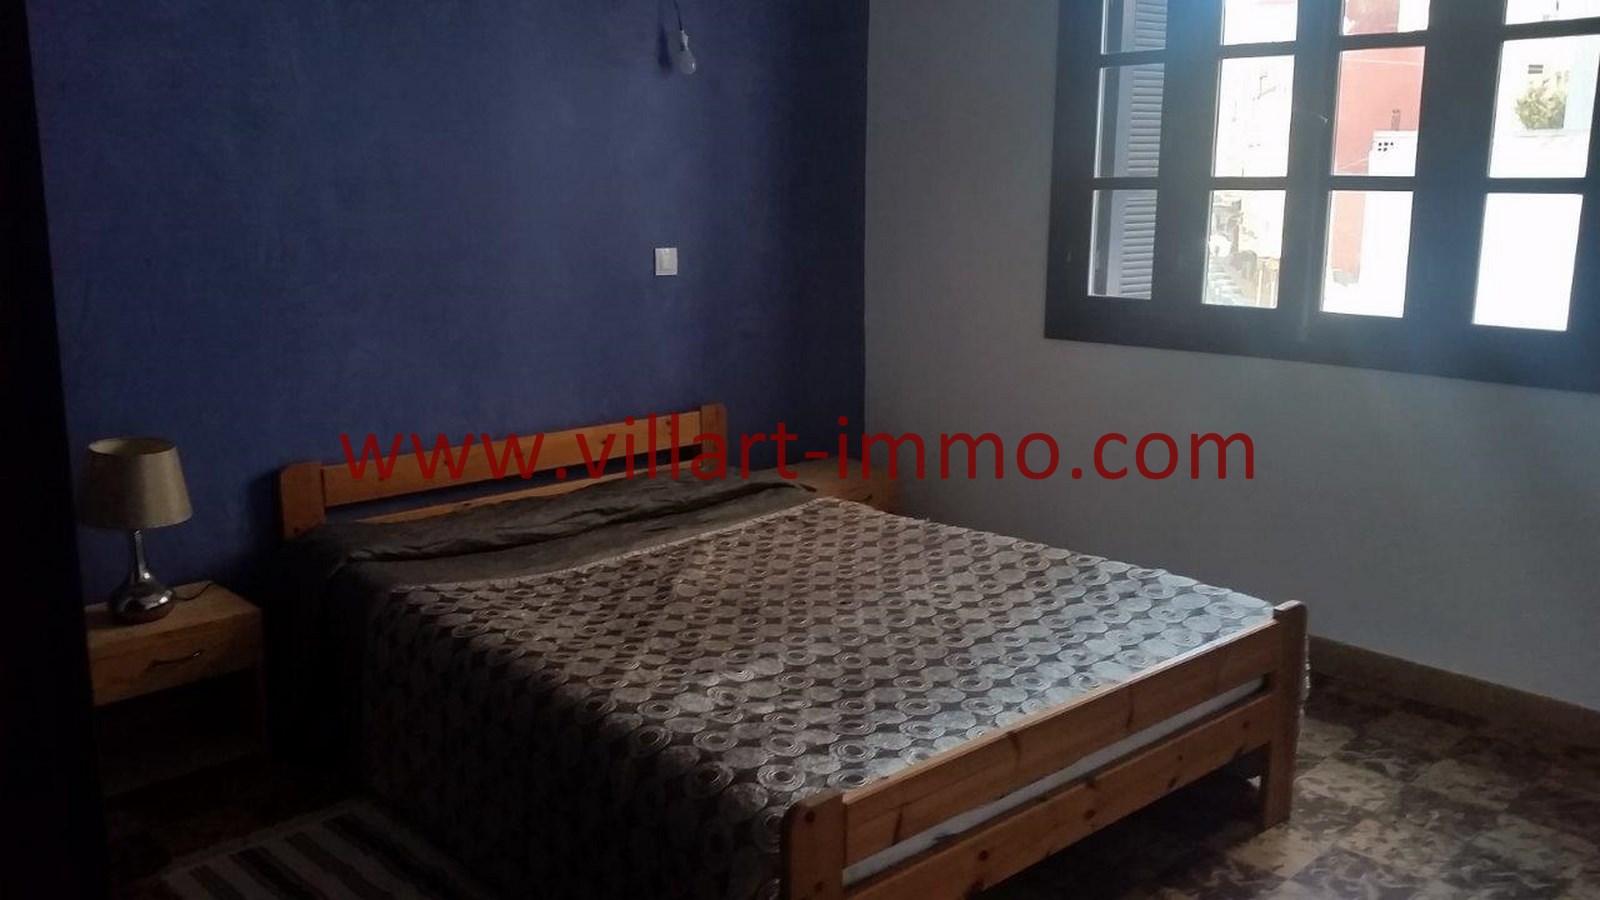 10-a-louer-appartement-meuble-centre-ville-tanger-chambre-2-l964-villart-immo